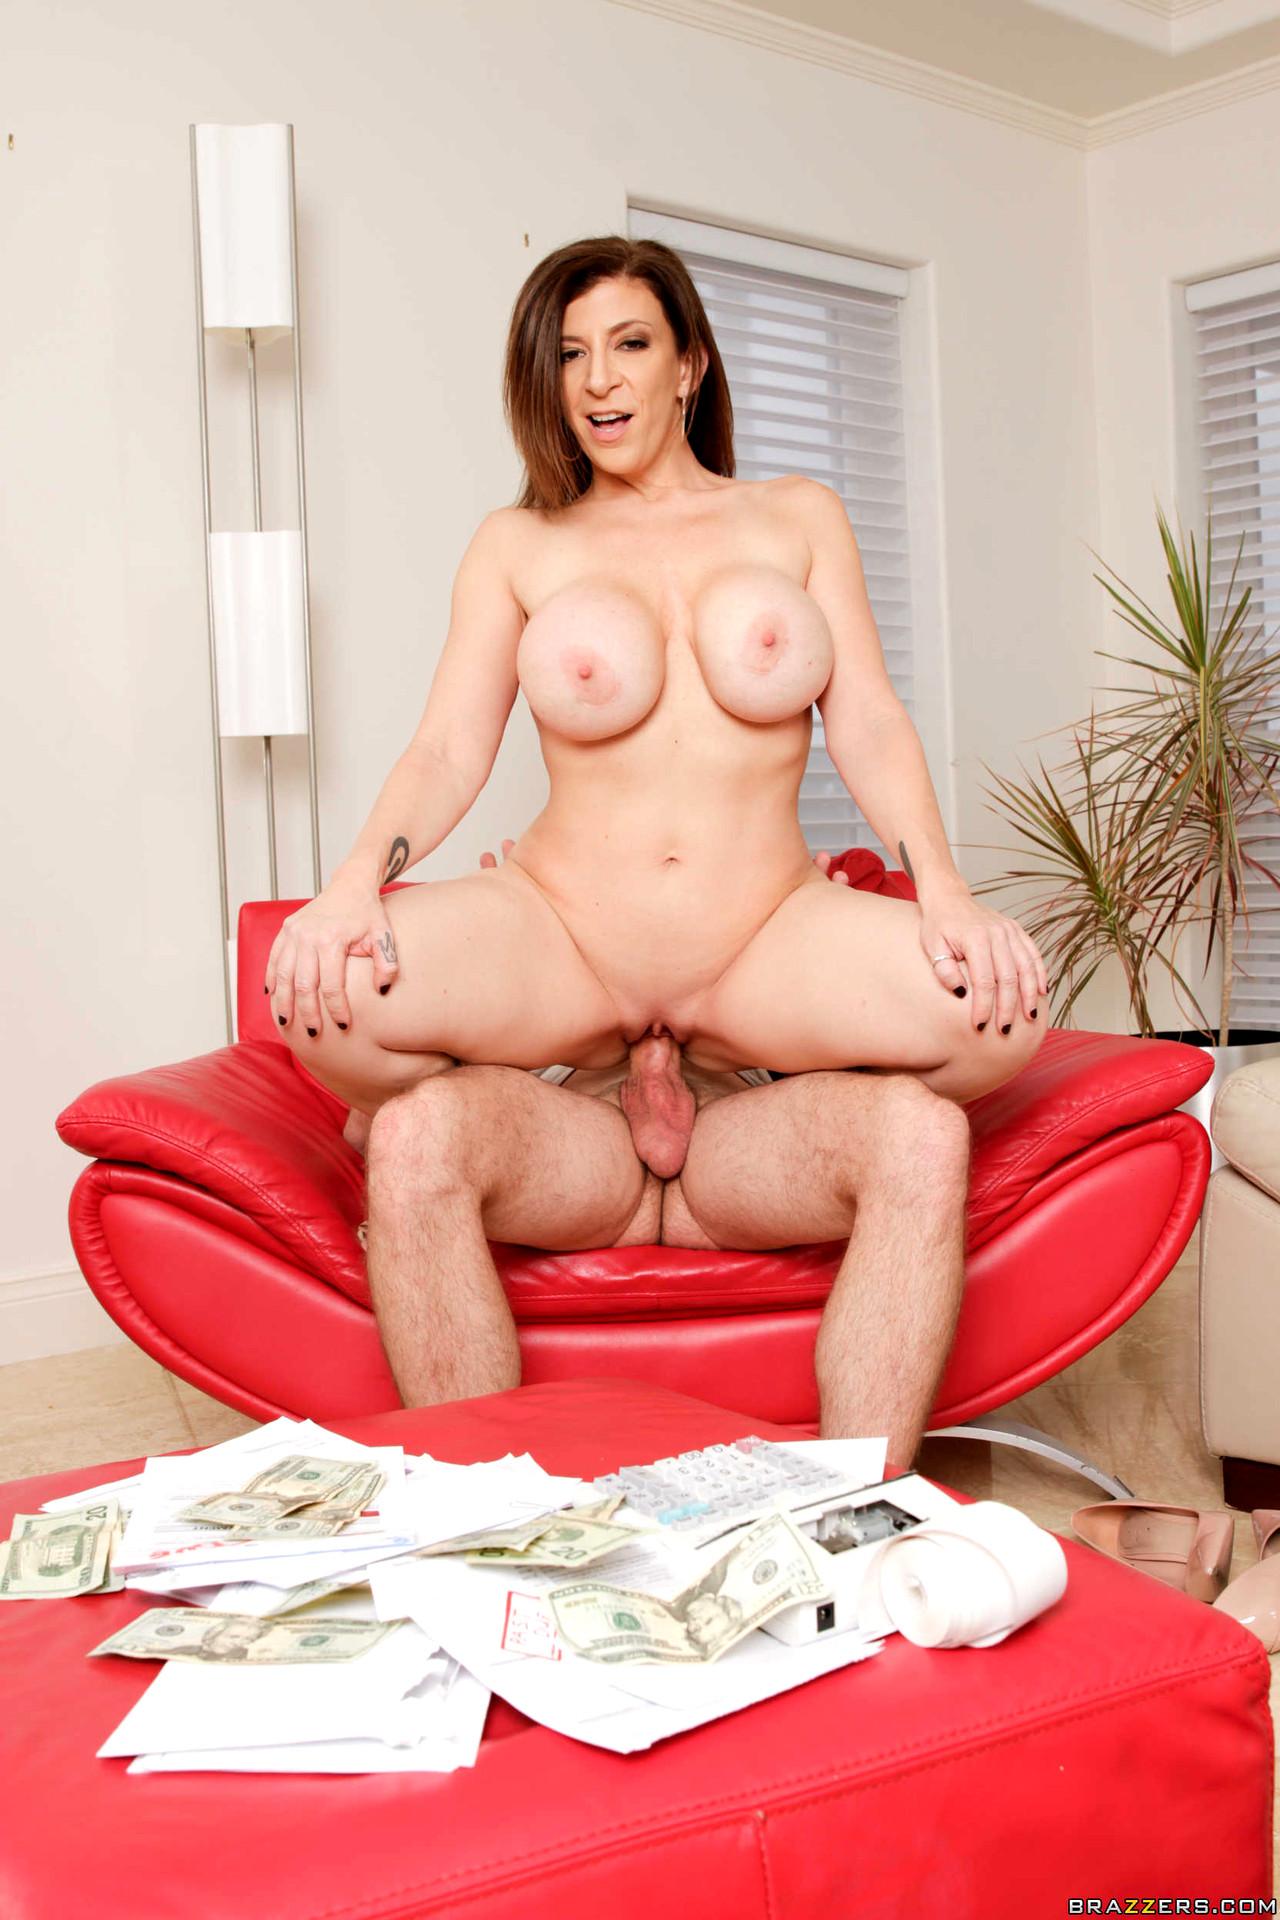 Putting her boobs to good use sara jay kyle mason pin up girl porn, hispeltrach